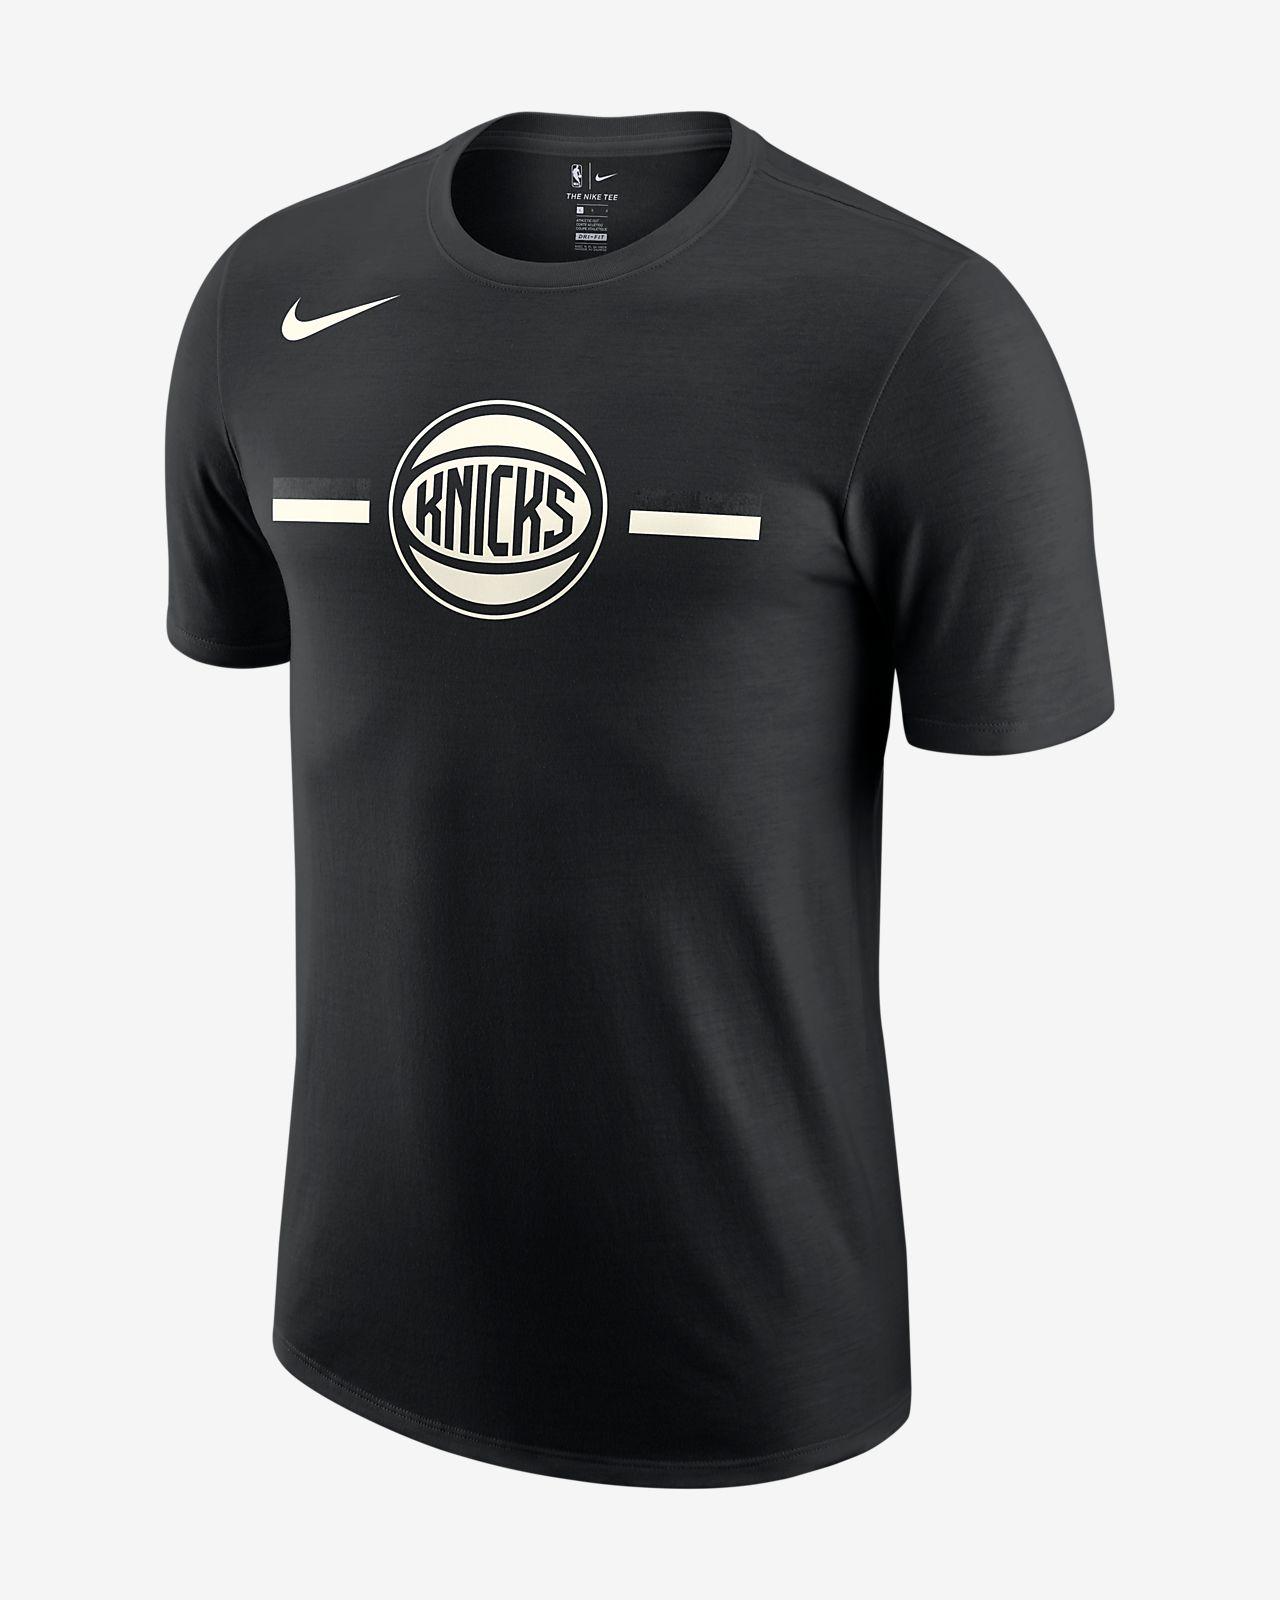 9afe01fe0 New York Knicks Nike Dri-FIT Men s NBA T-Shirt. Nike.com GB